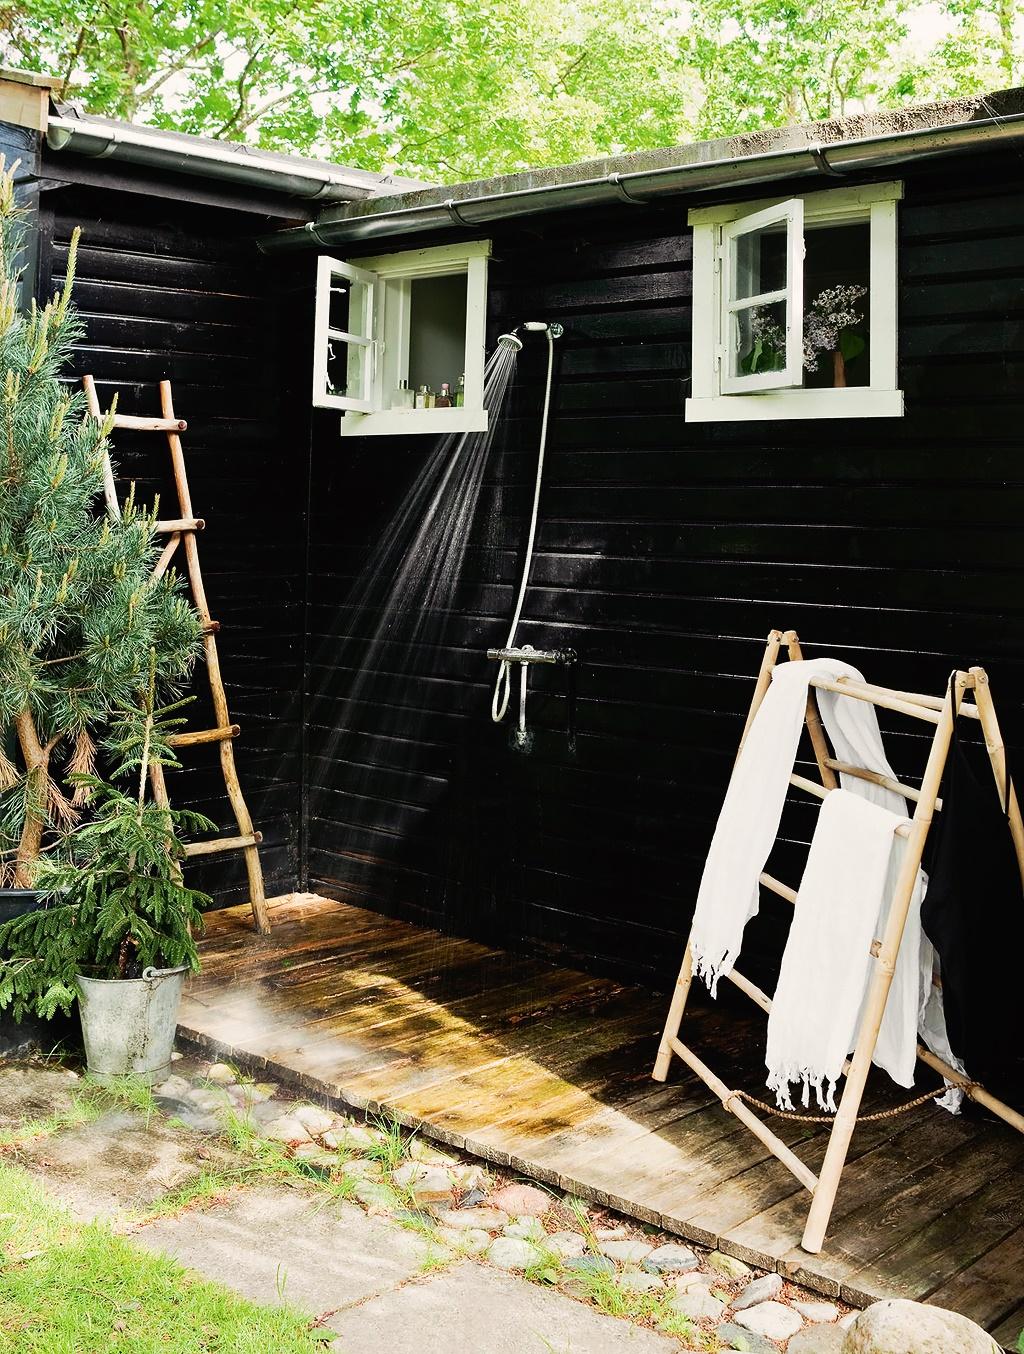 Casa de Verano Escandinava Ducha Exterior